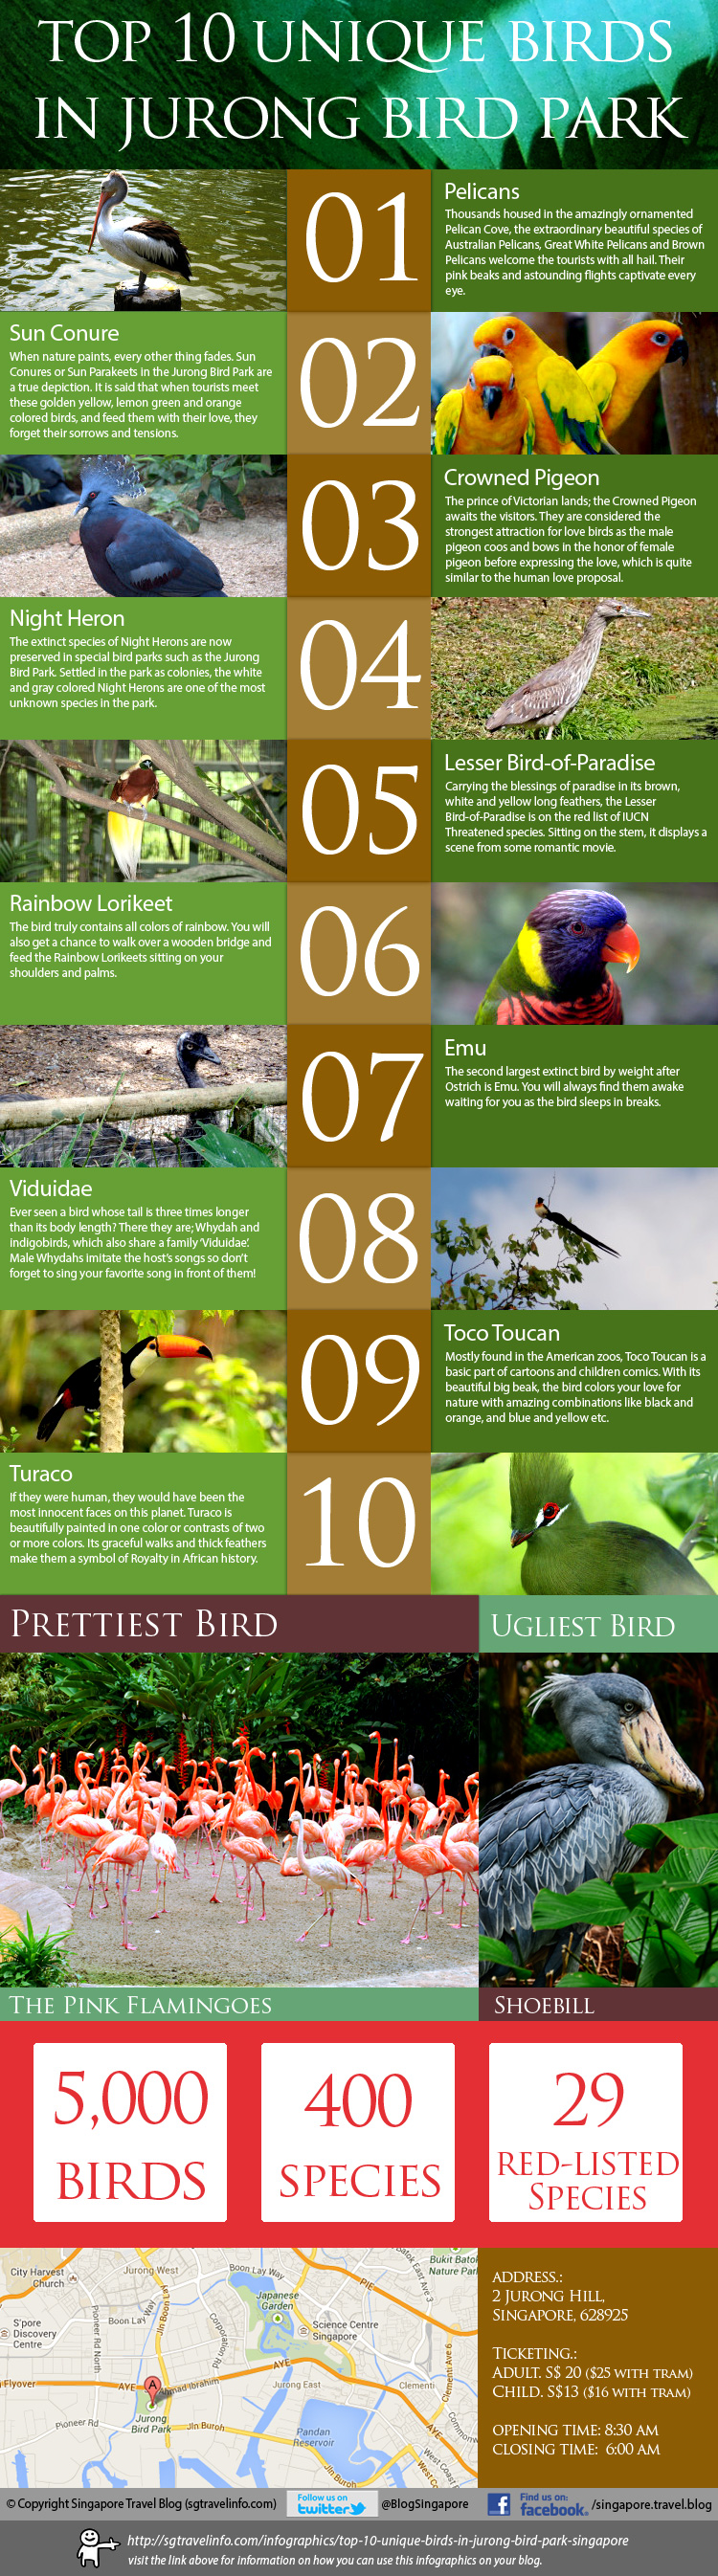 20. Top ten unique birds in Jurong Bird Park